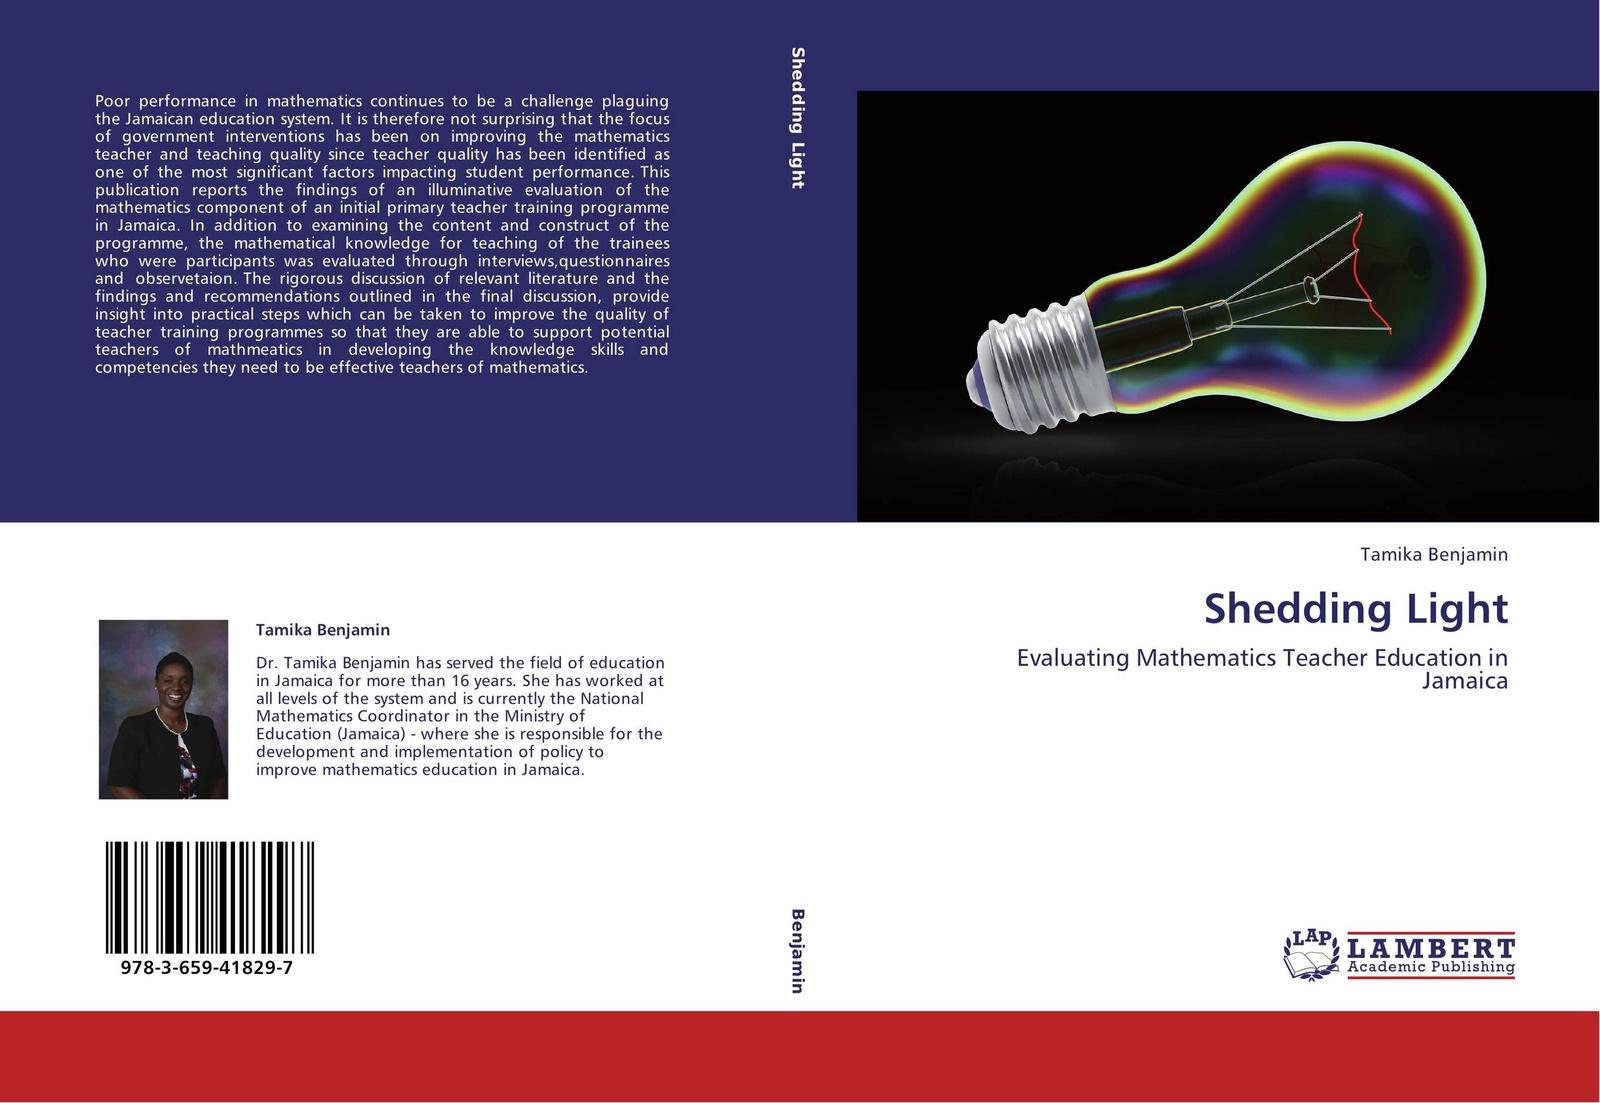 Tamika Benjamin Shedding Light innovative reflections of teacher training programmes